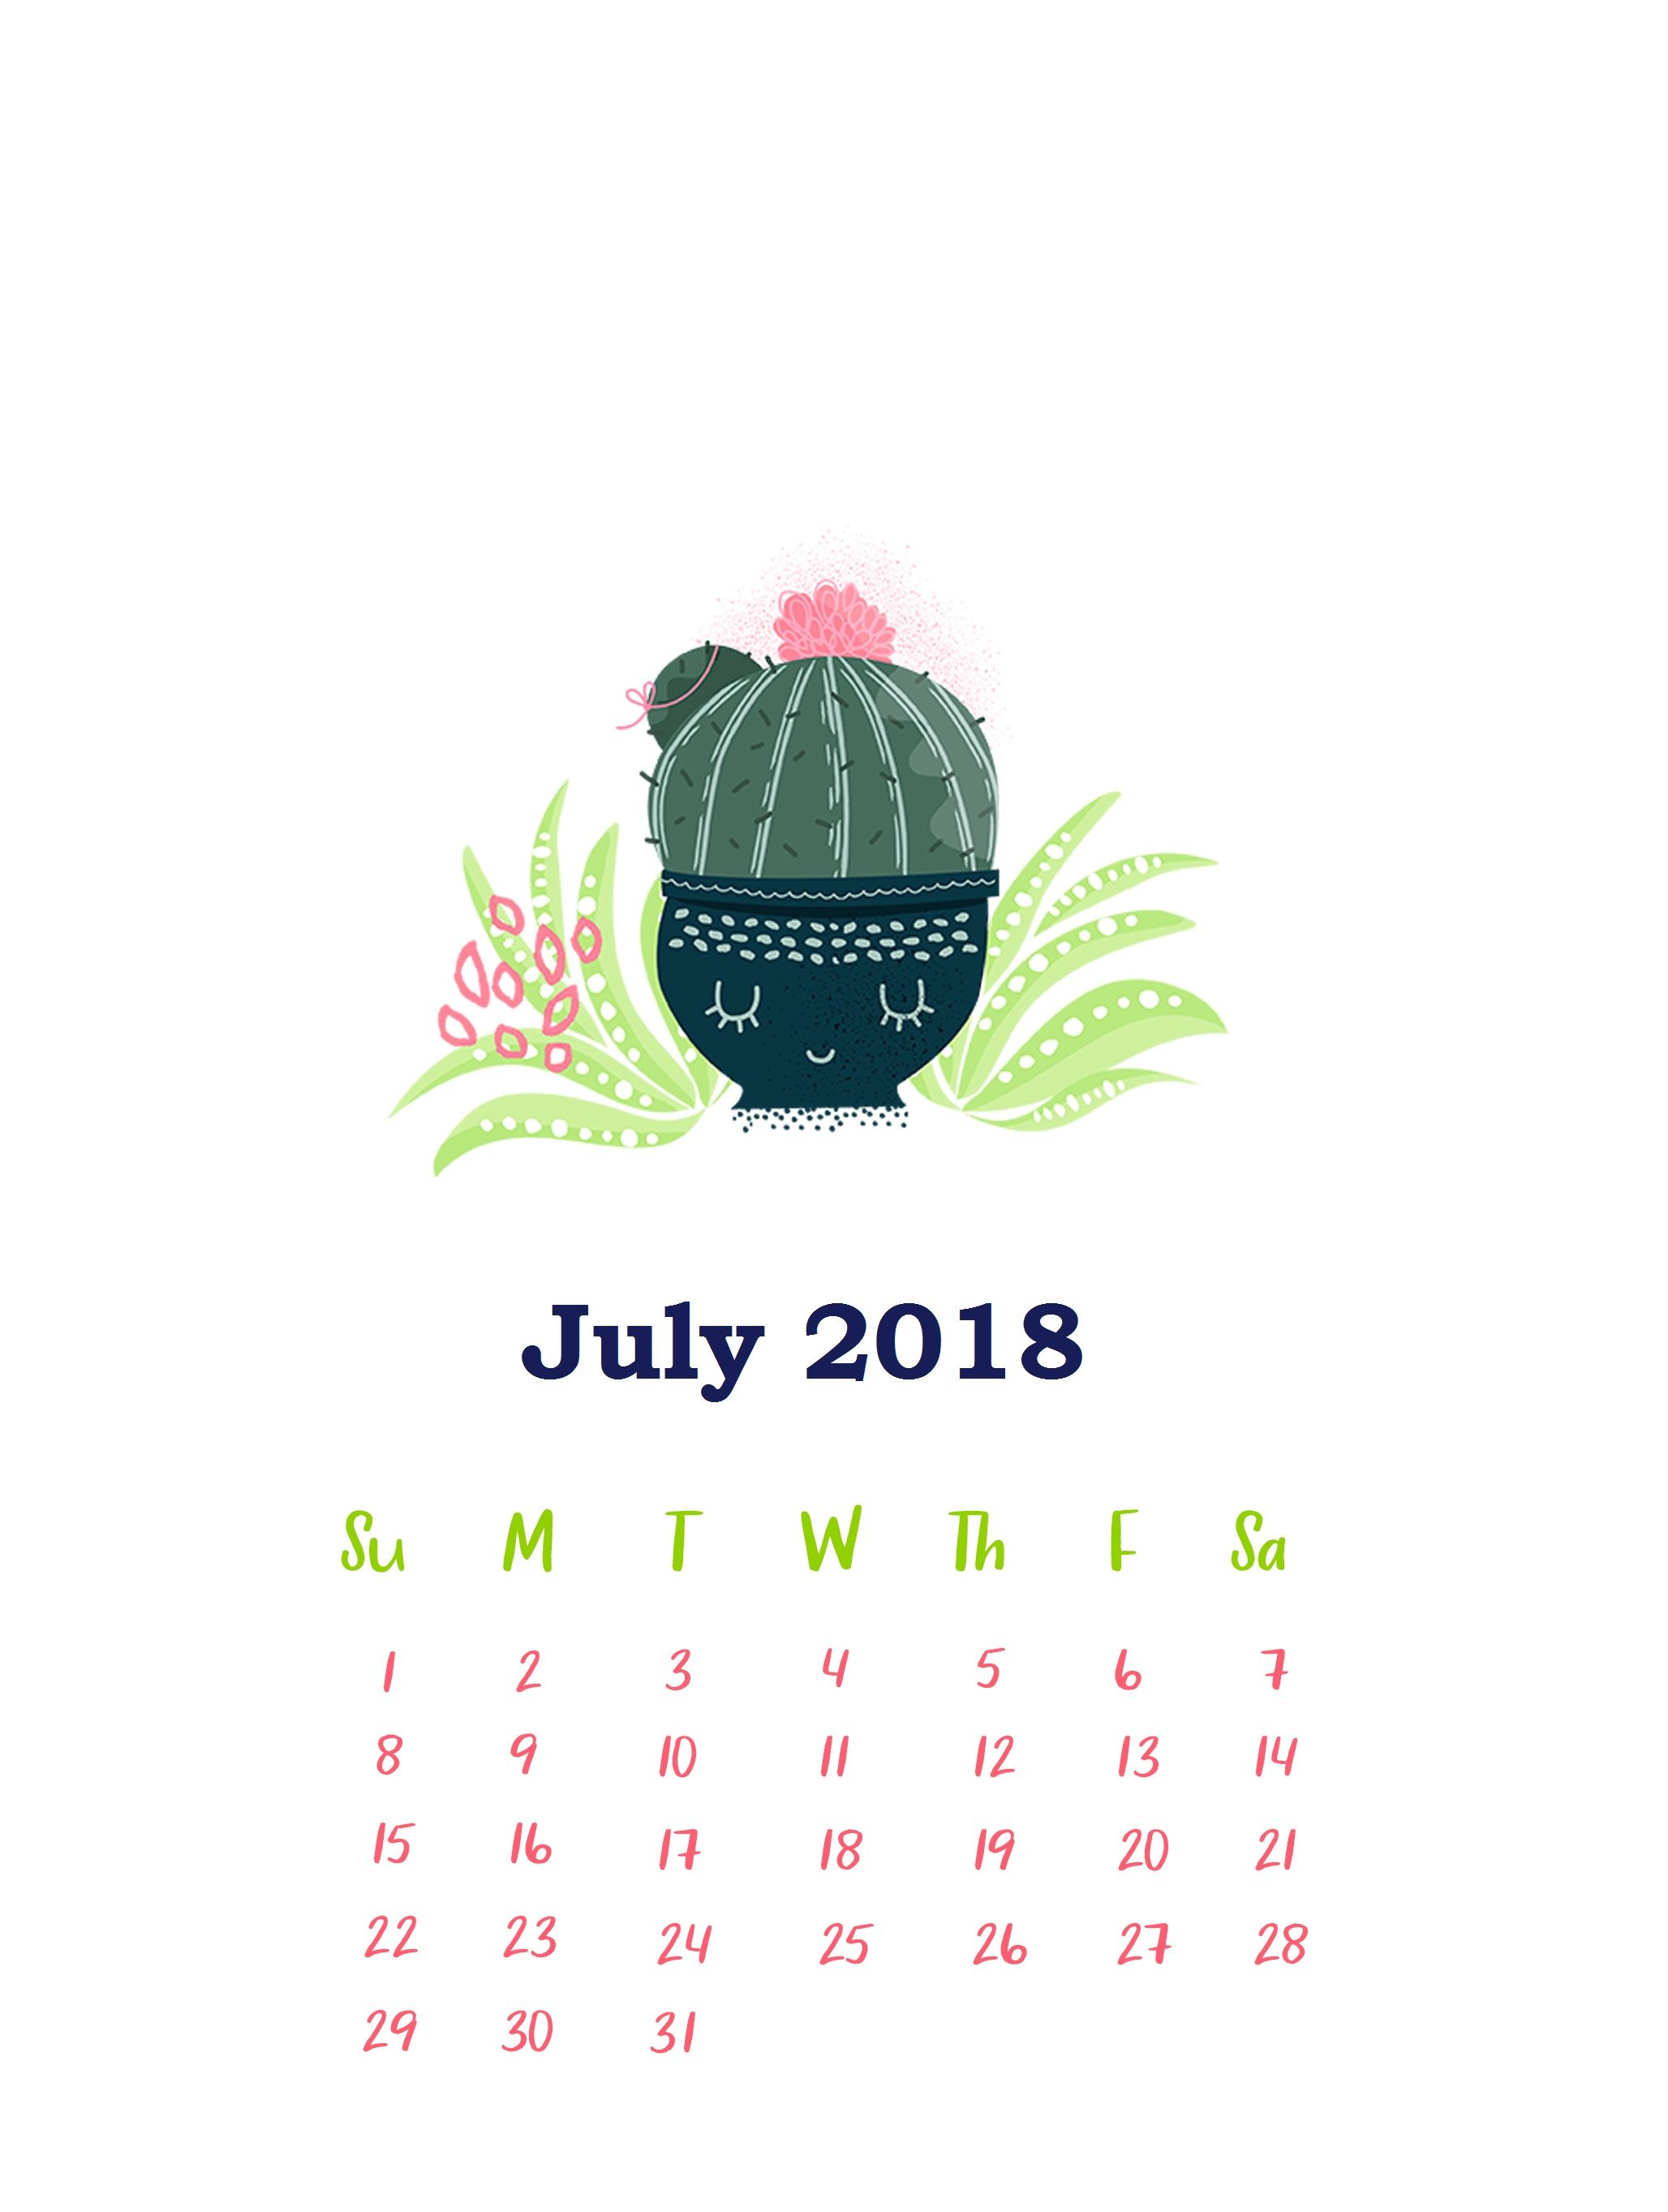 IPhone July 2018 HD Calendar Wallpaper